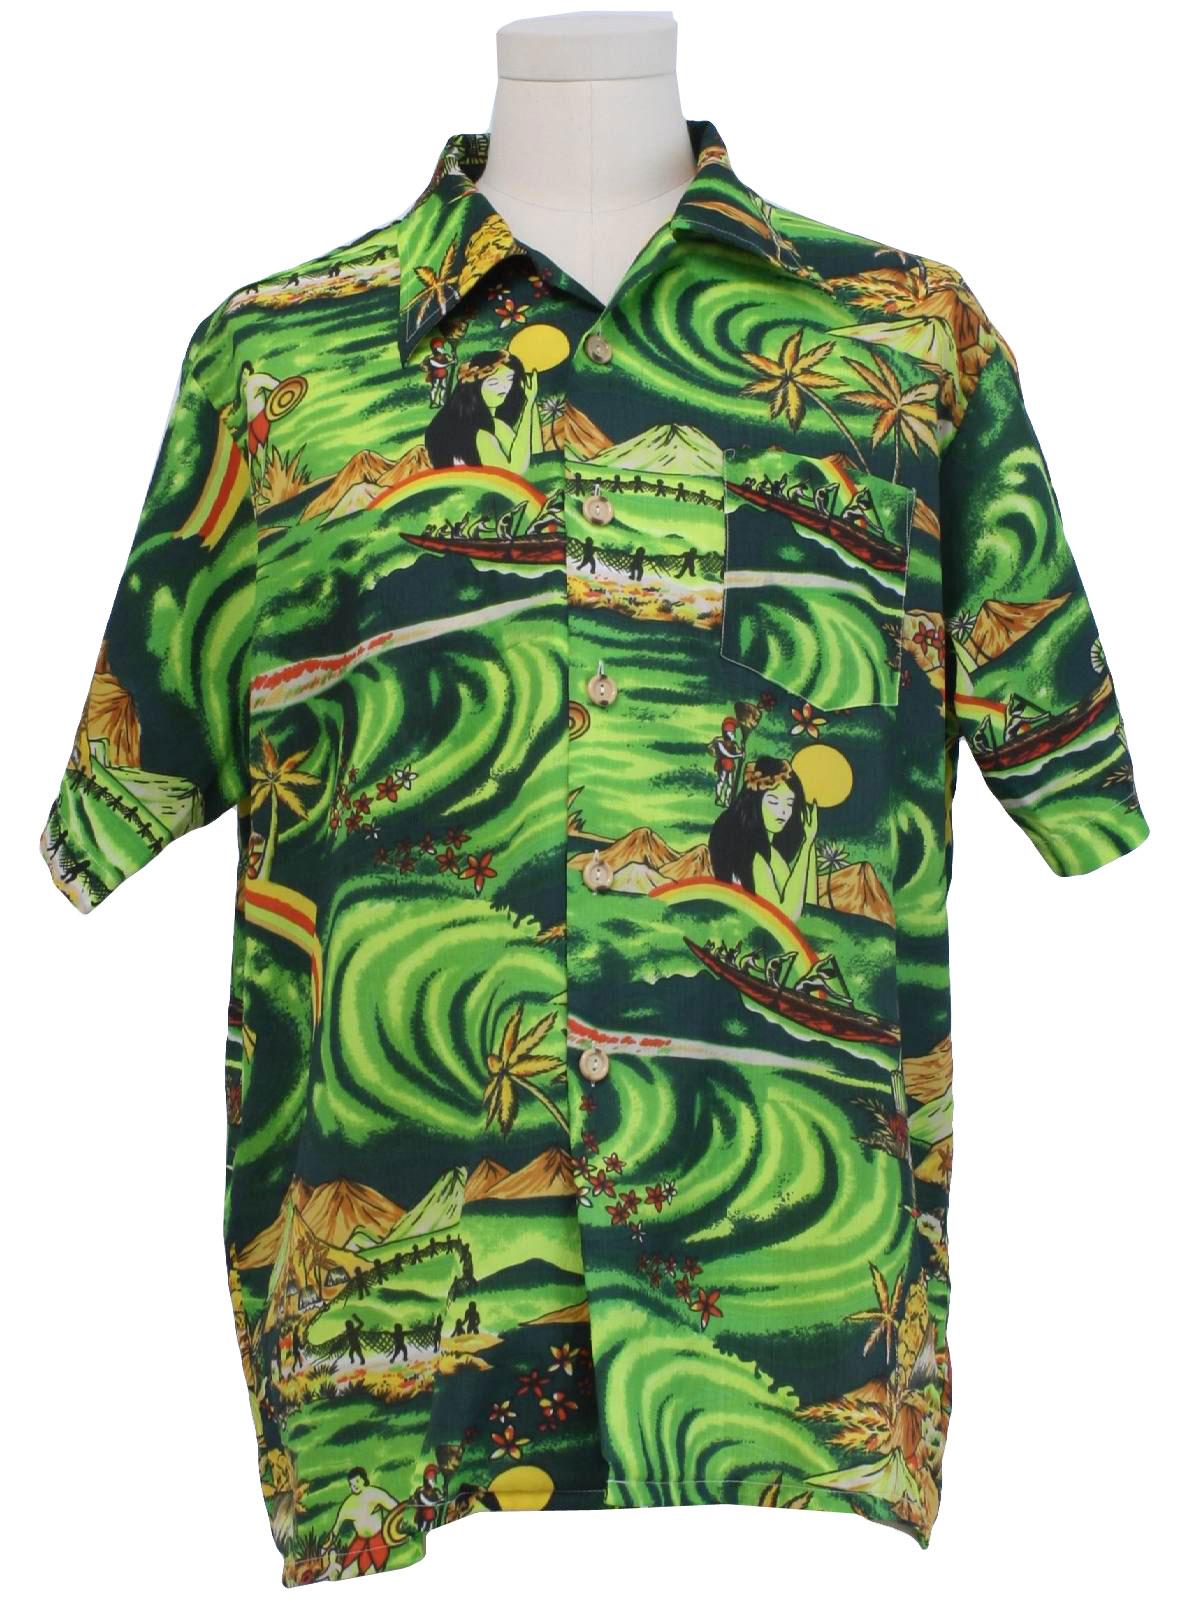 79235a600e337 1970s Towncraft JCPenney Hawaiian Shirt  70s -Towncraft JCPenney ...